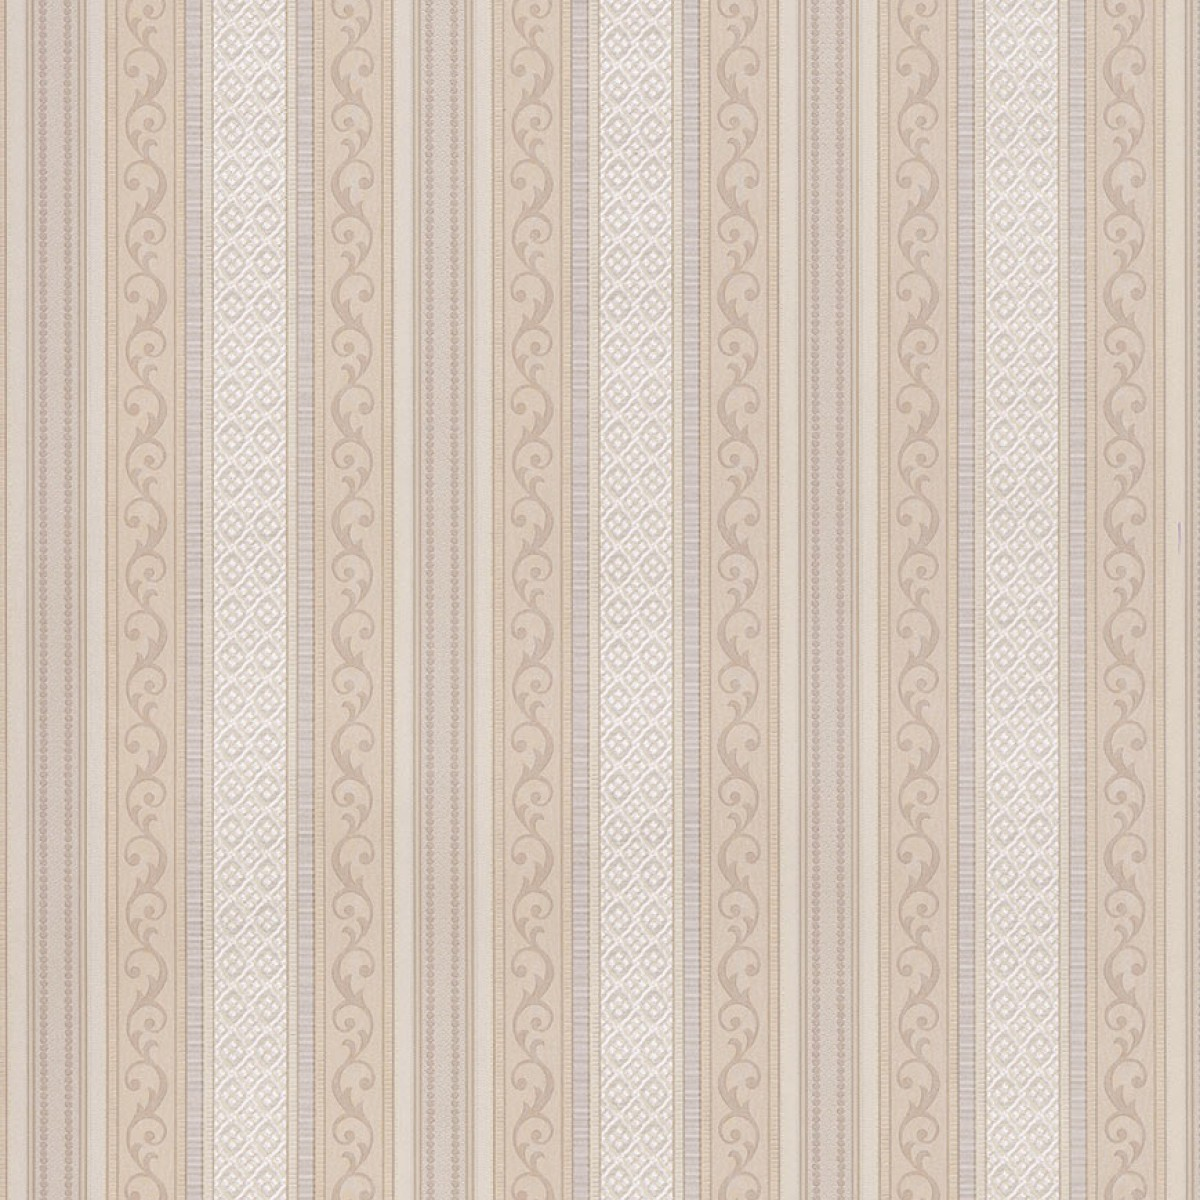 Tapet lavabil Chambord 361071, 5.2mp / rolă, Eijffinger